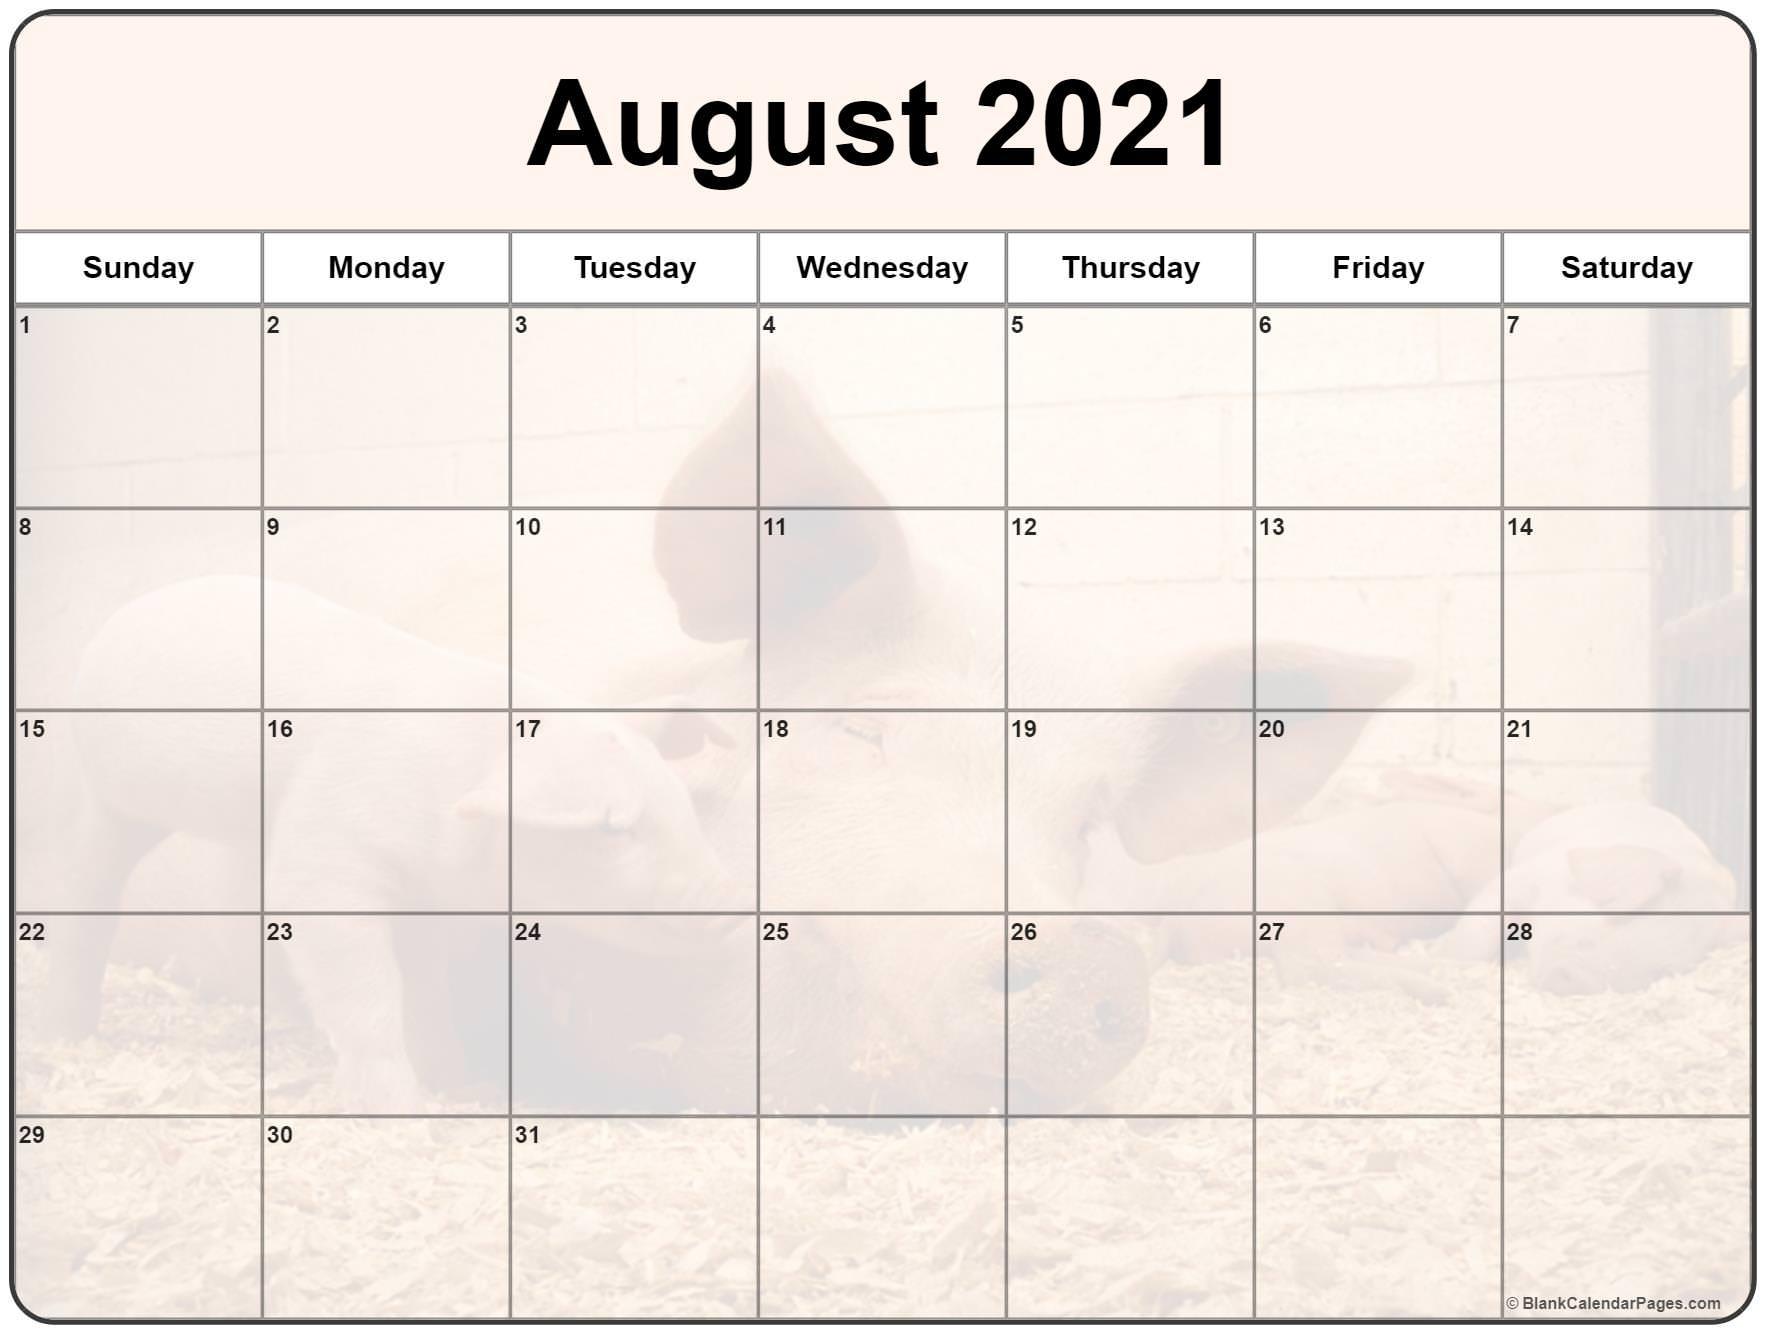 collection of august 2021 photo calendars::Cute Agust 2021 Calendar